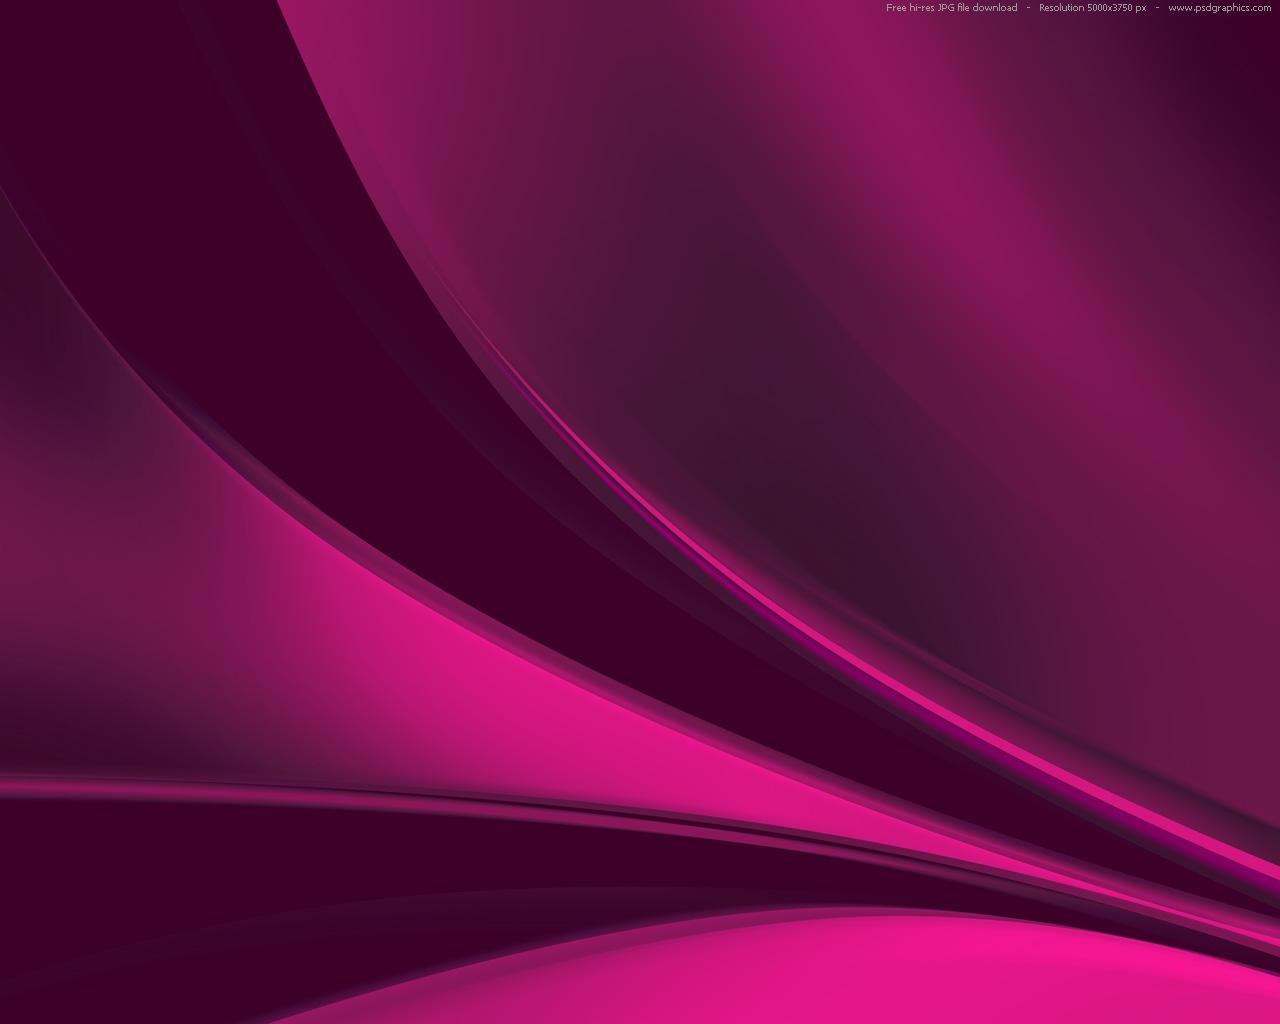 abstract dark blue background psdgraphics dark purple abstract 1280x1024